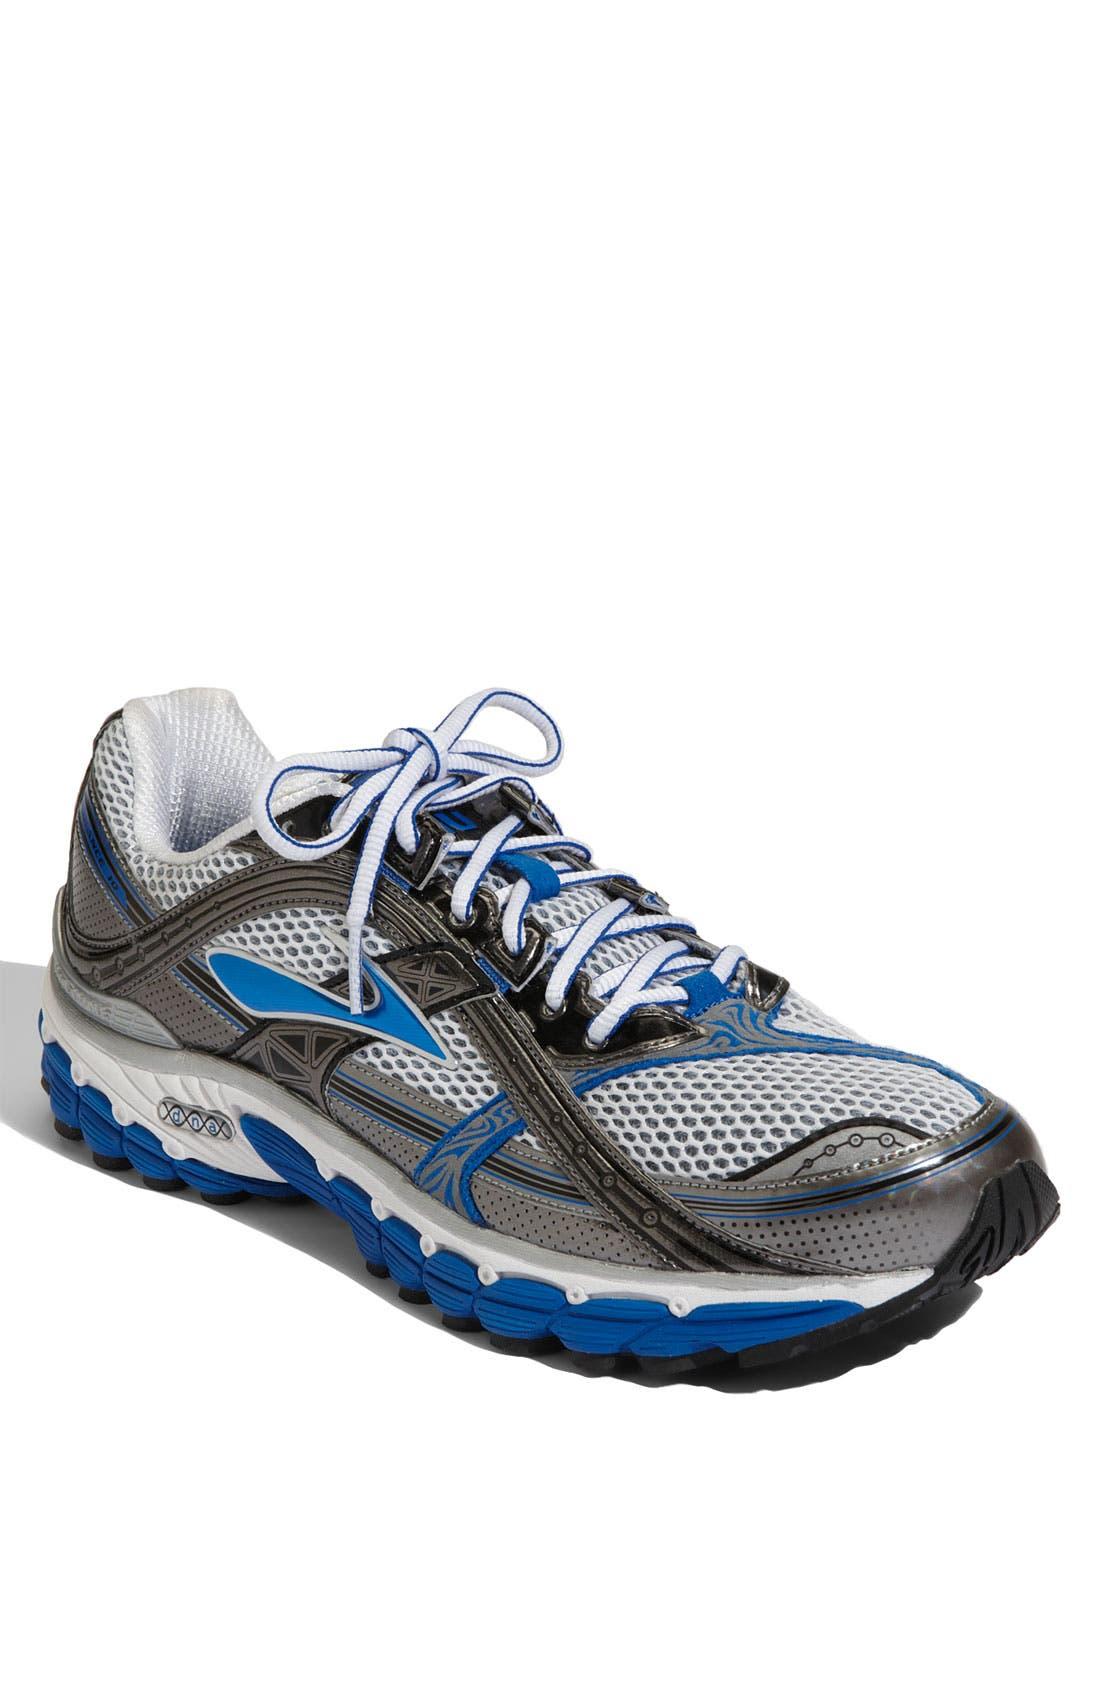 Alternate Image 1 Selected - Brooks 'Trance 10' Running Shoe (Men)